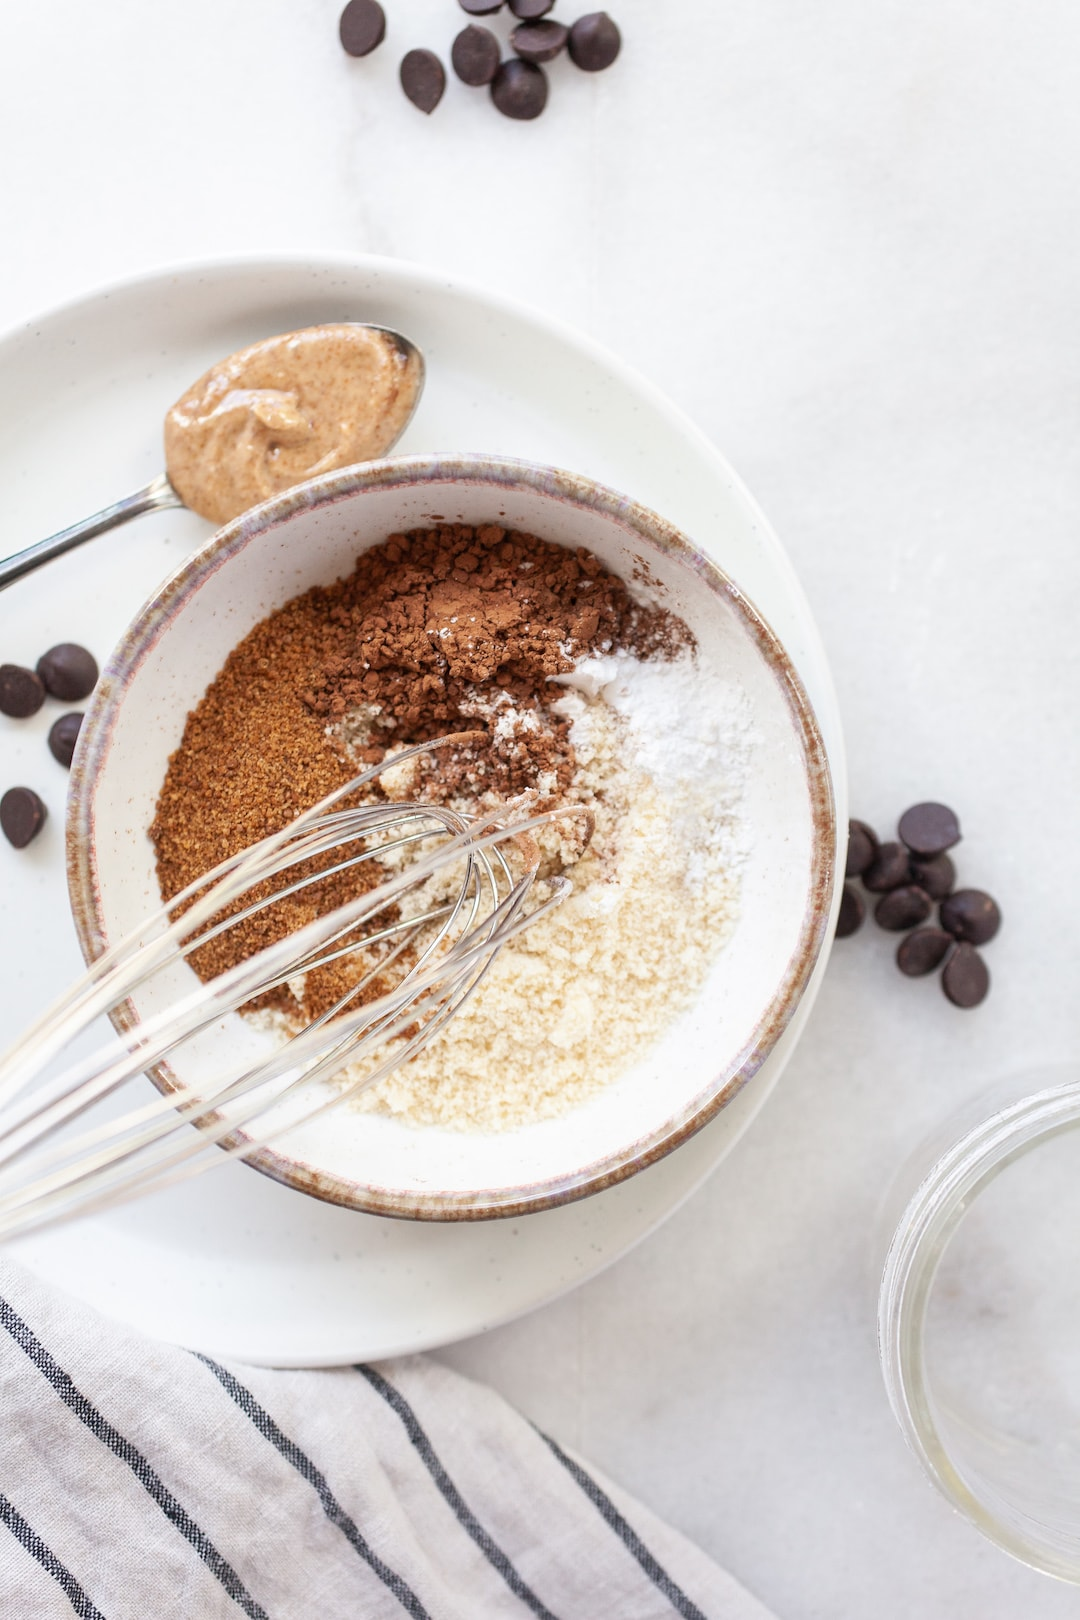 ingredients for vegan mug brownie in a small bowl